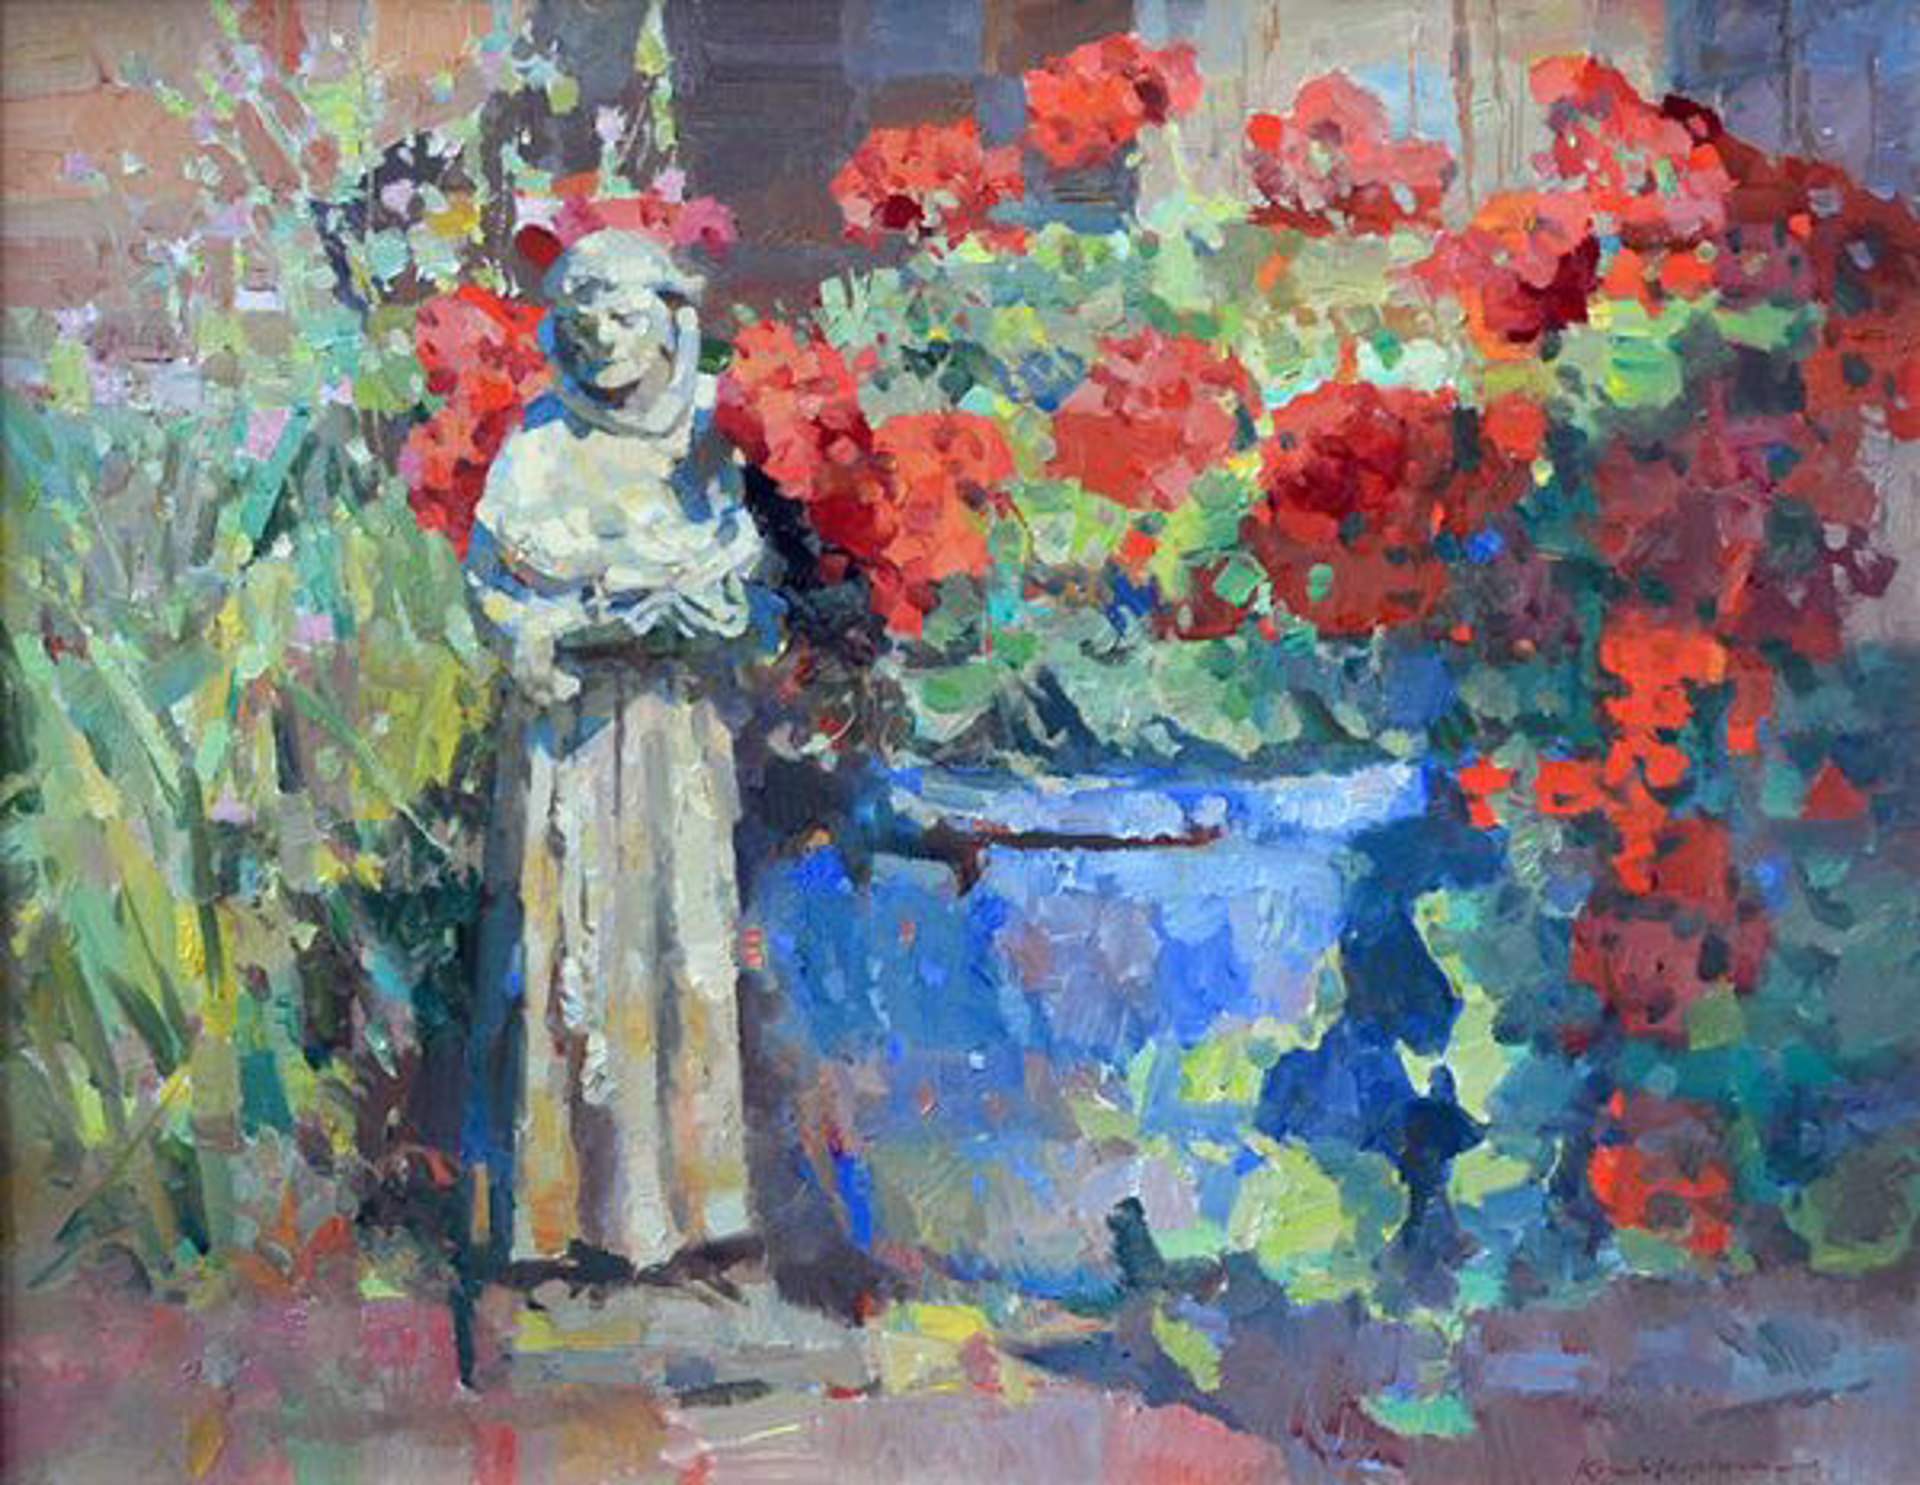 Garden Saint by Kevin Macpherson